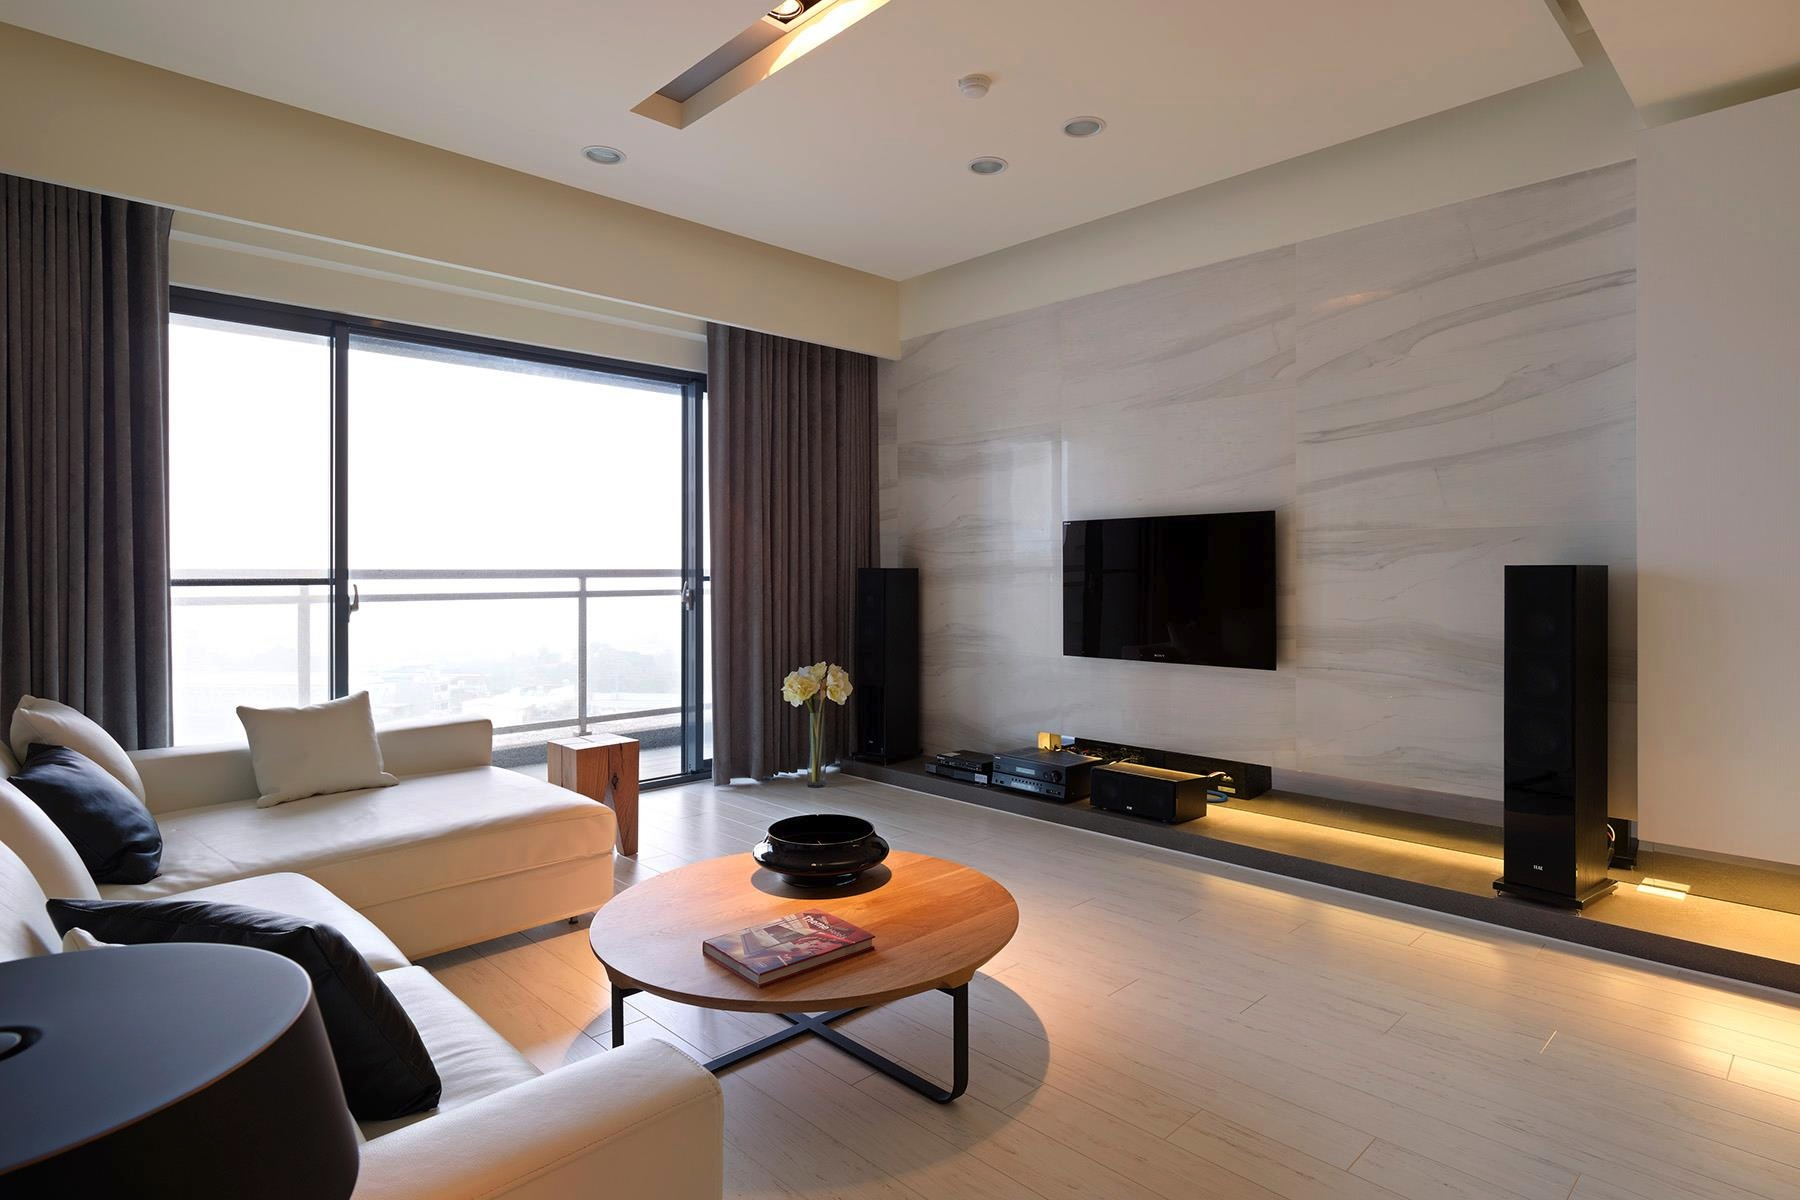 Entertainment wall interior design ideas - Modern interior wall design ideas ...